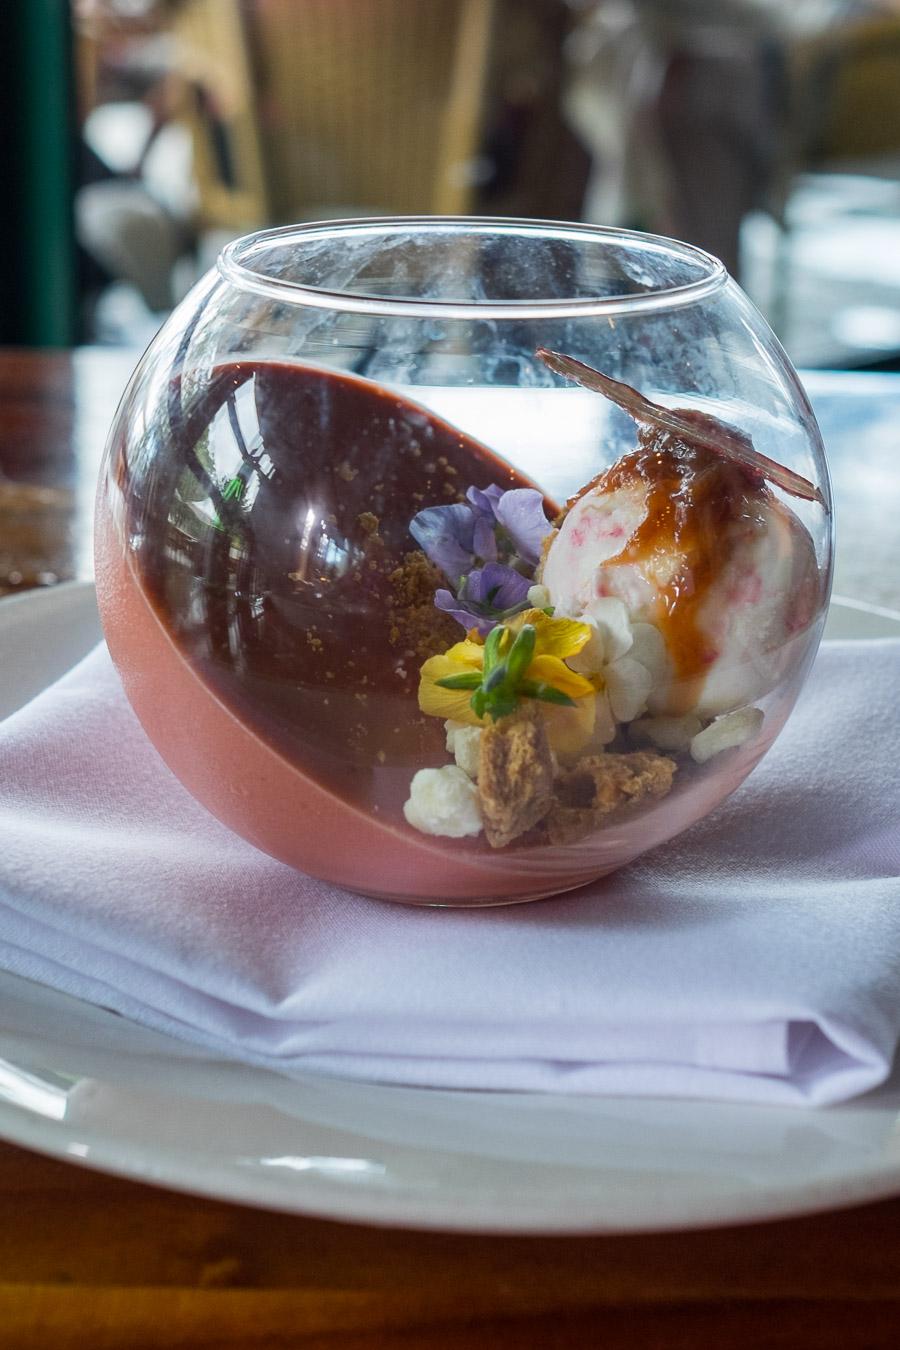 Rhubarb and buttermilk panna cotta (AU$18) with shortbread, white chocolate ganache and frozen yoghurt.